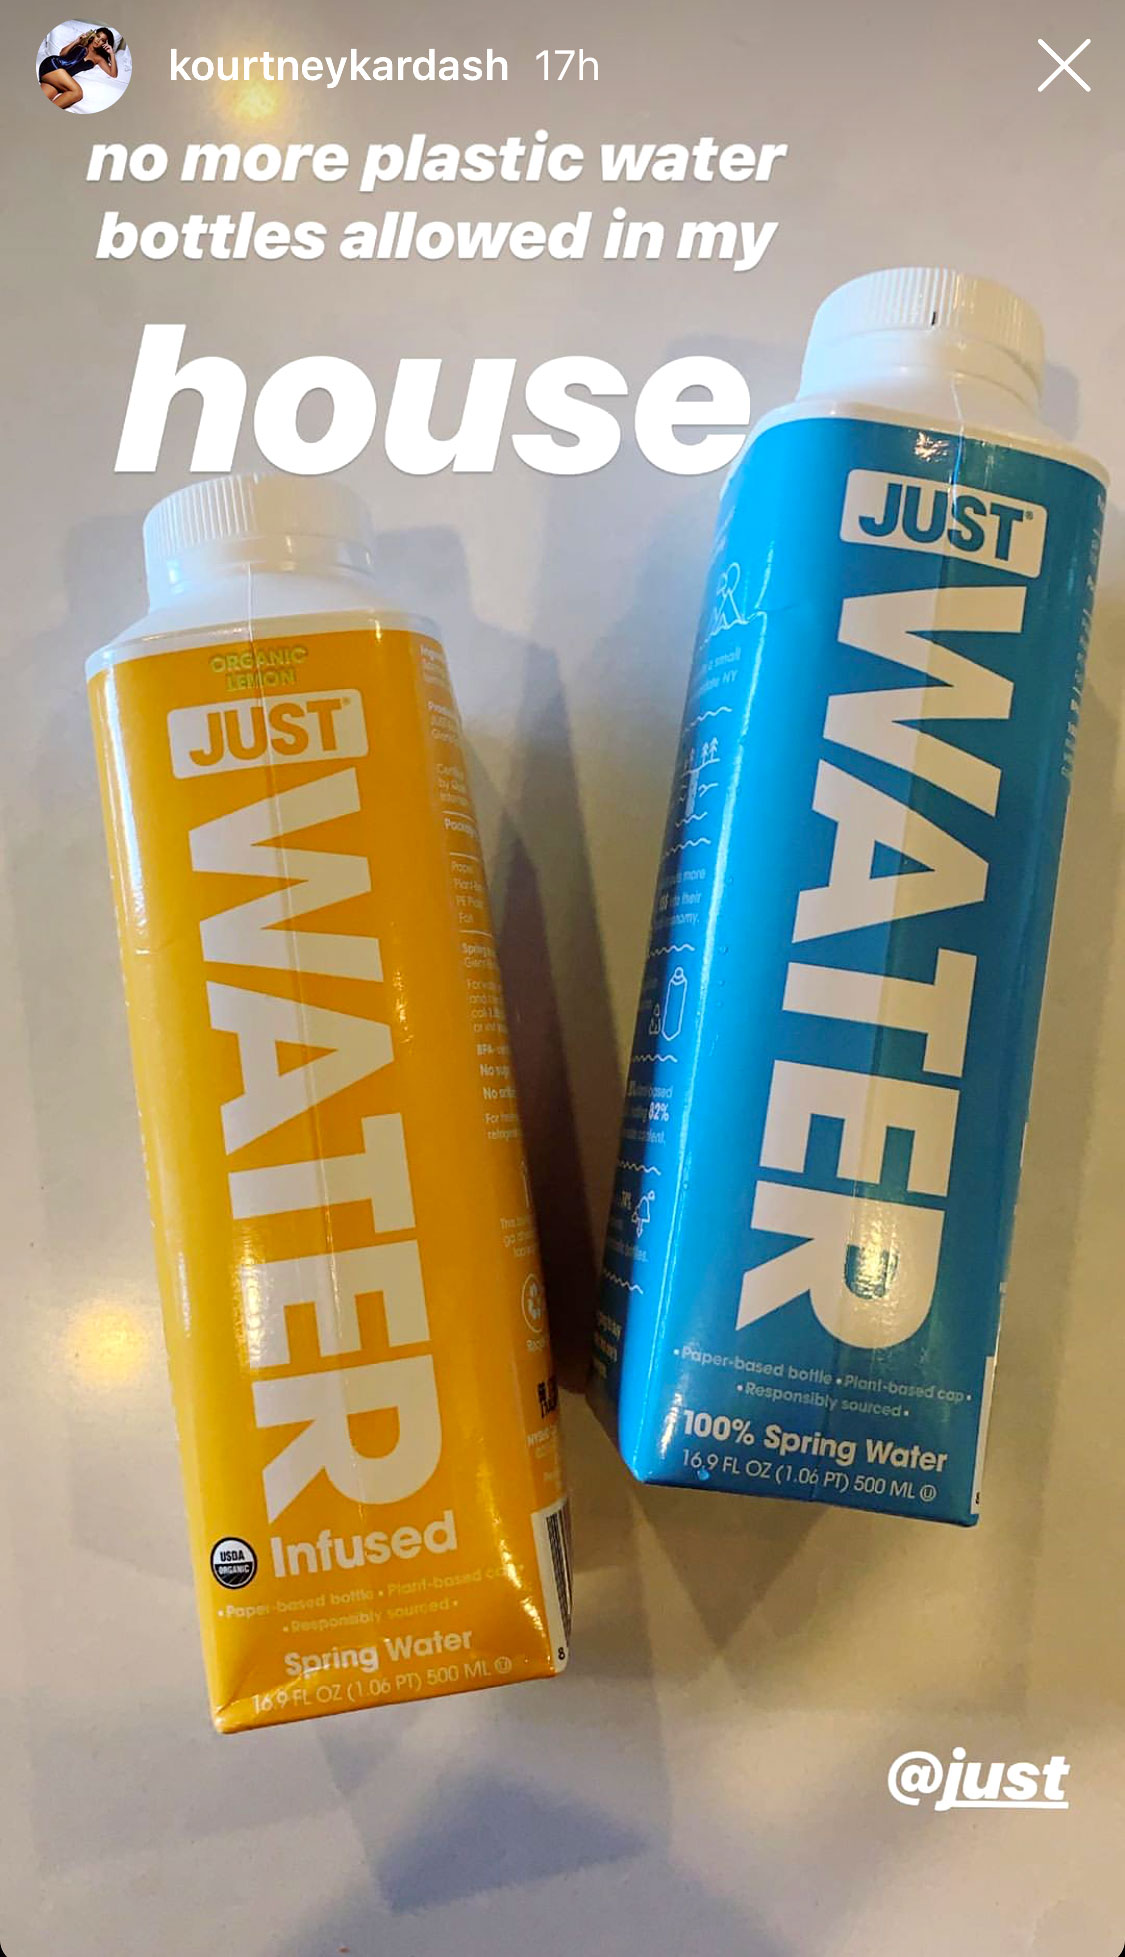 Kourtney Kardashian Bans Plastic Water Bottles in Her House: 'No More' - Kourtney Kardashian/Instagram